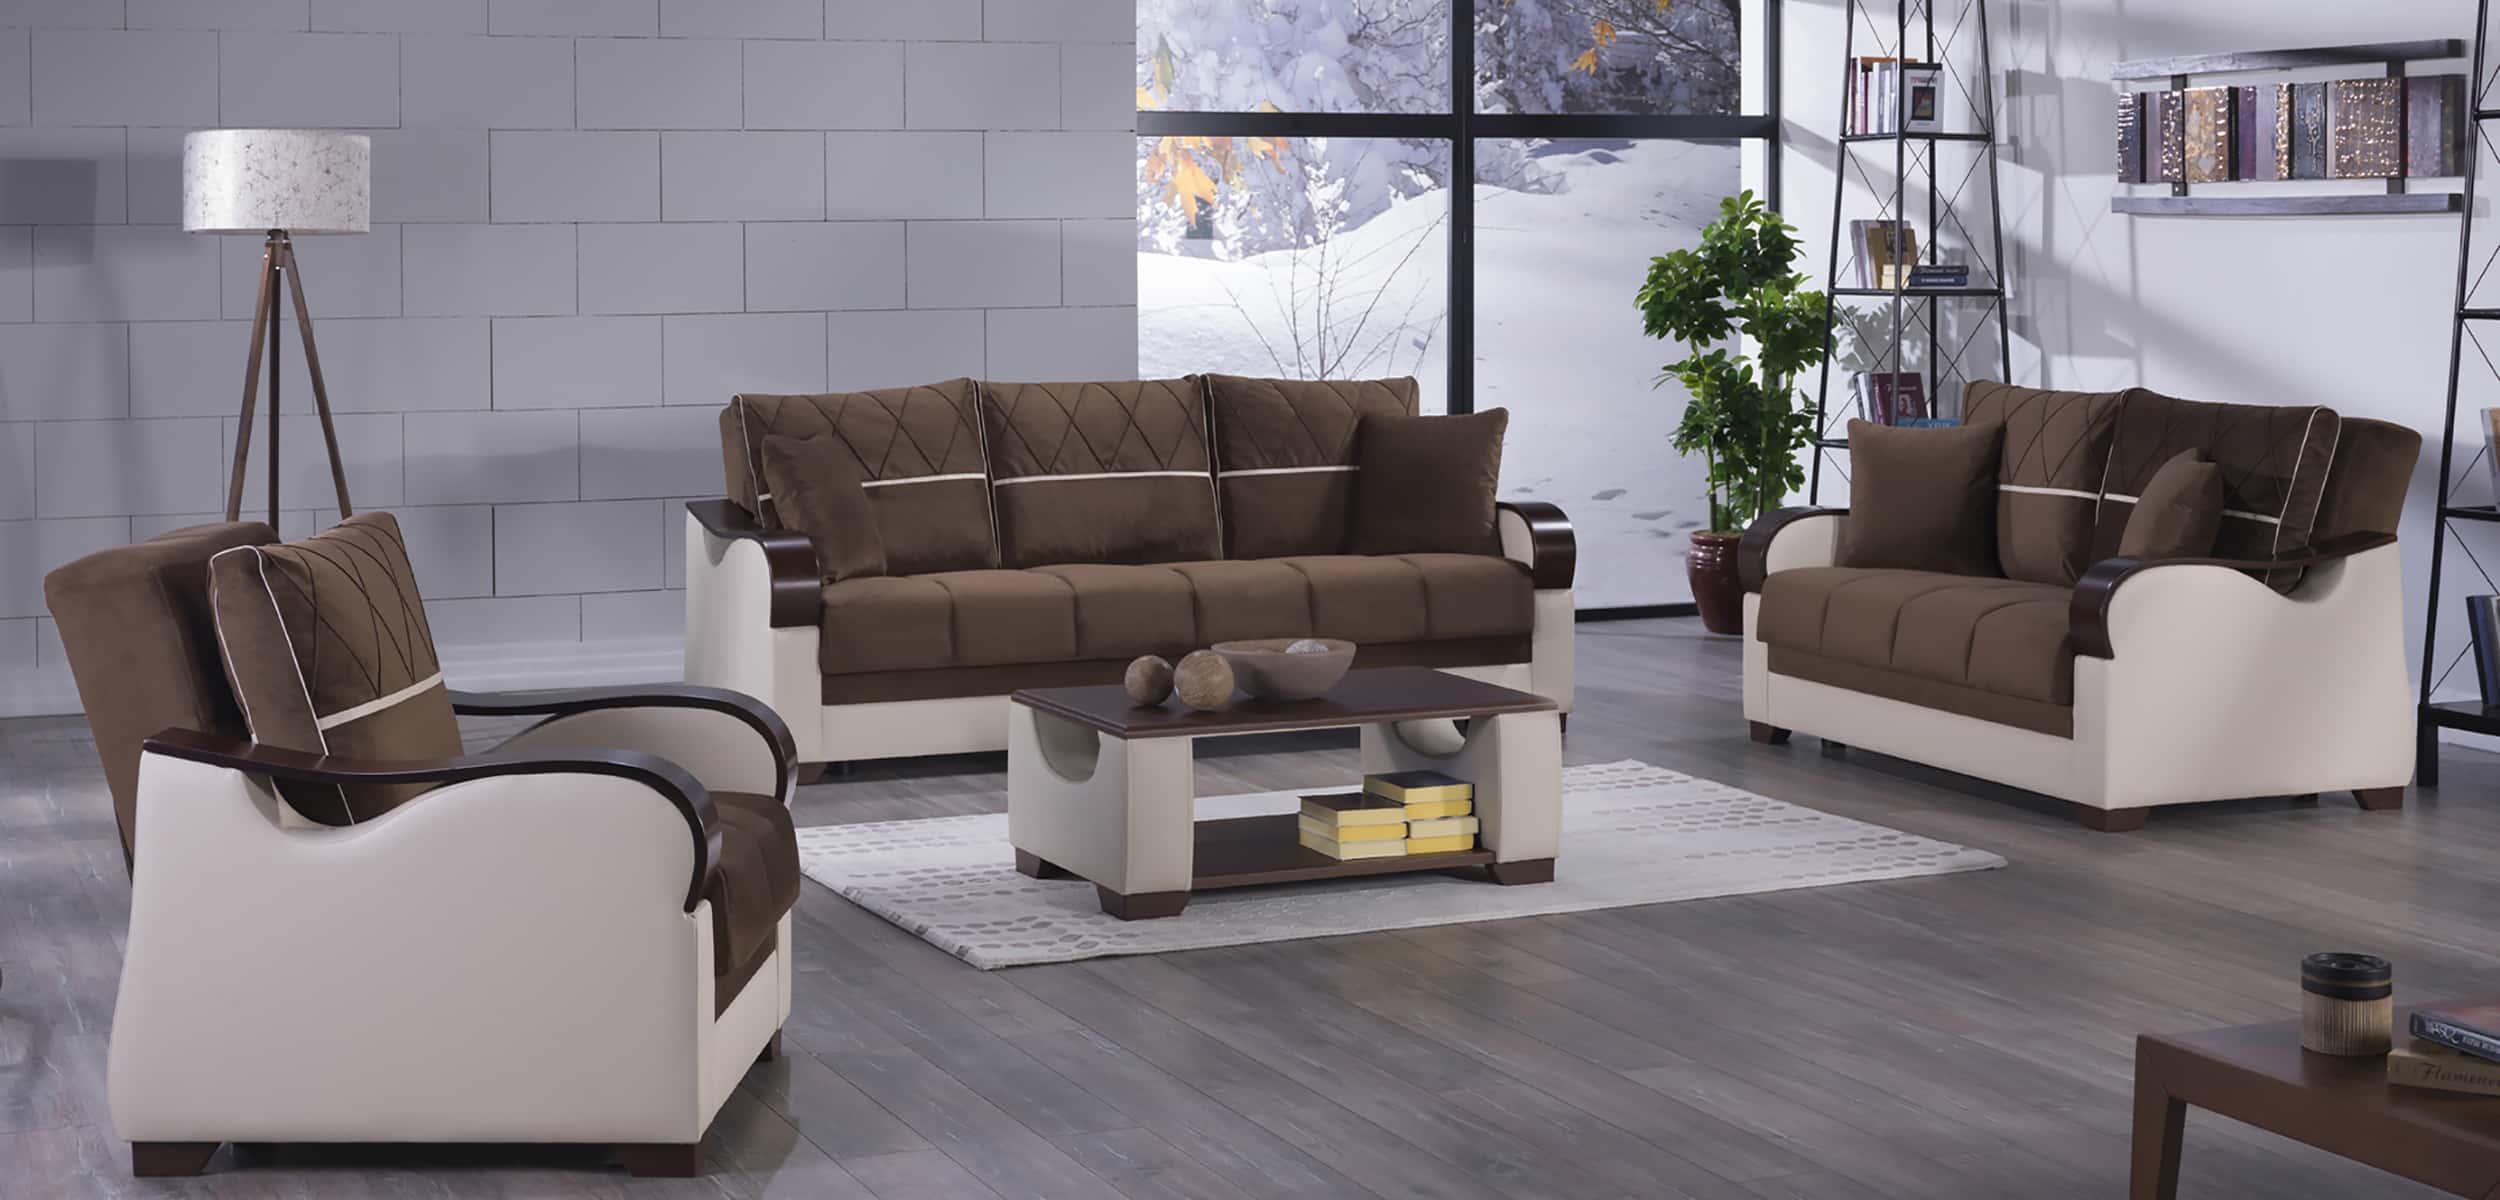 Bennett Best Brown Sofa Love & Chair by Sunset